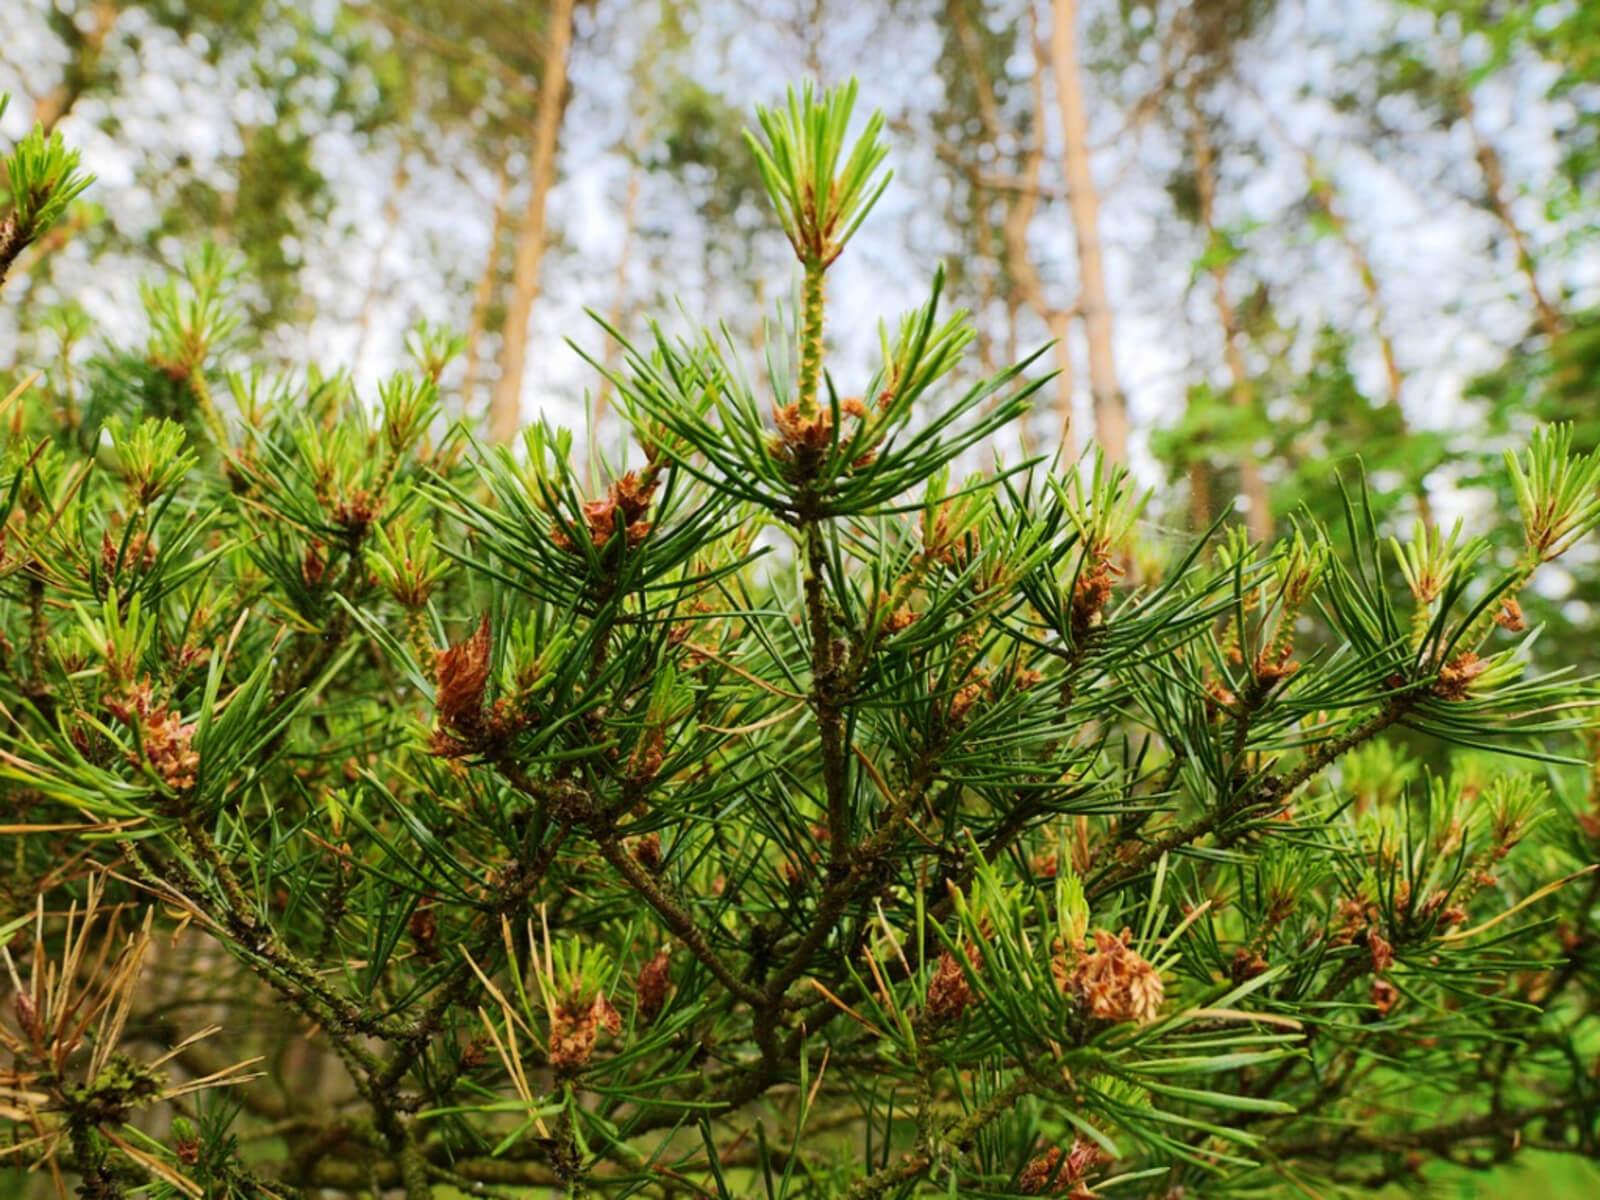 Scots (Scotch) Pine Tree